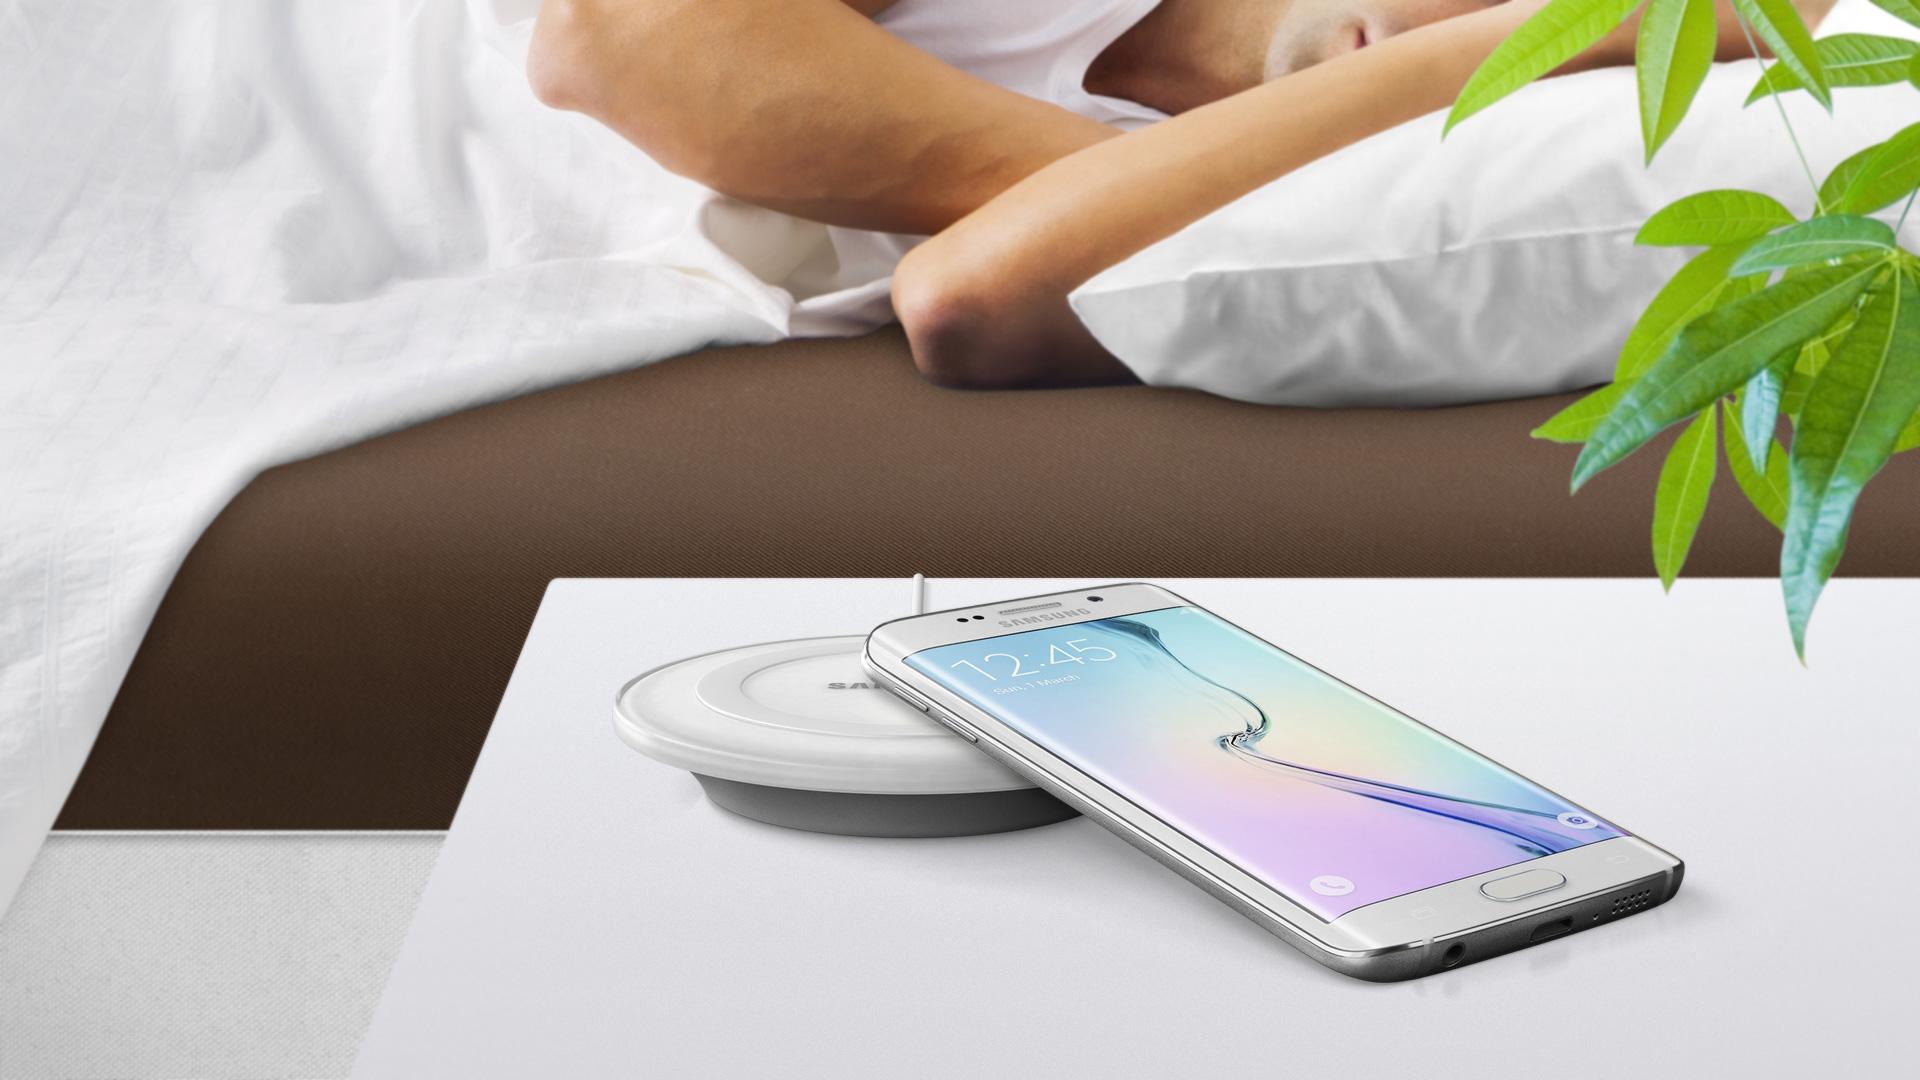 Samsung Galaxy s6 - wireless